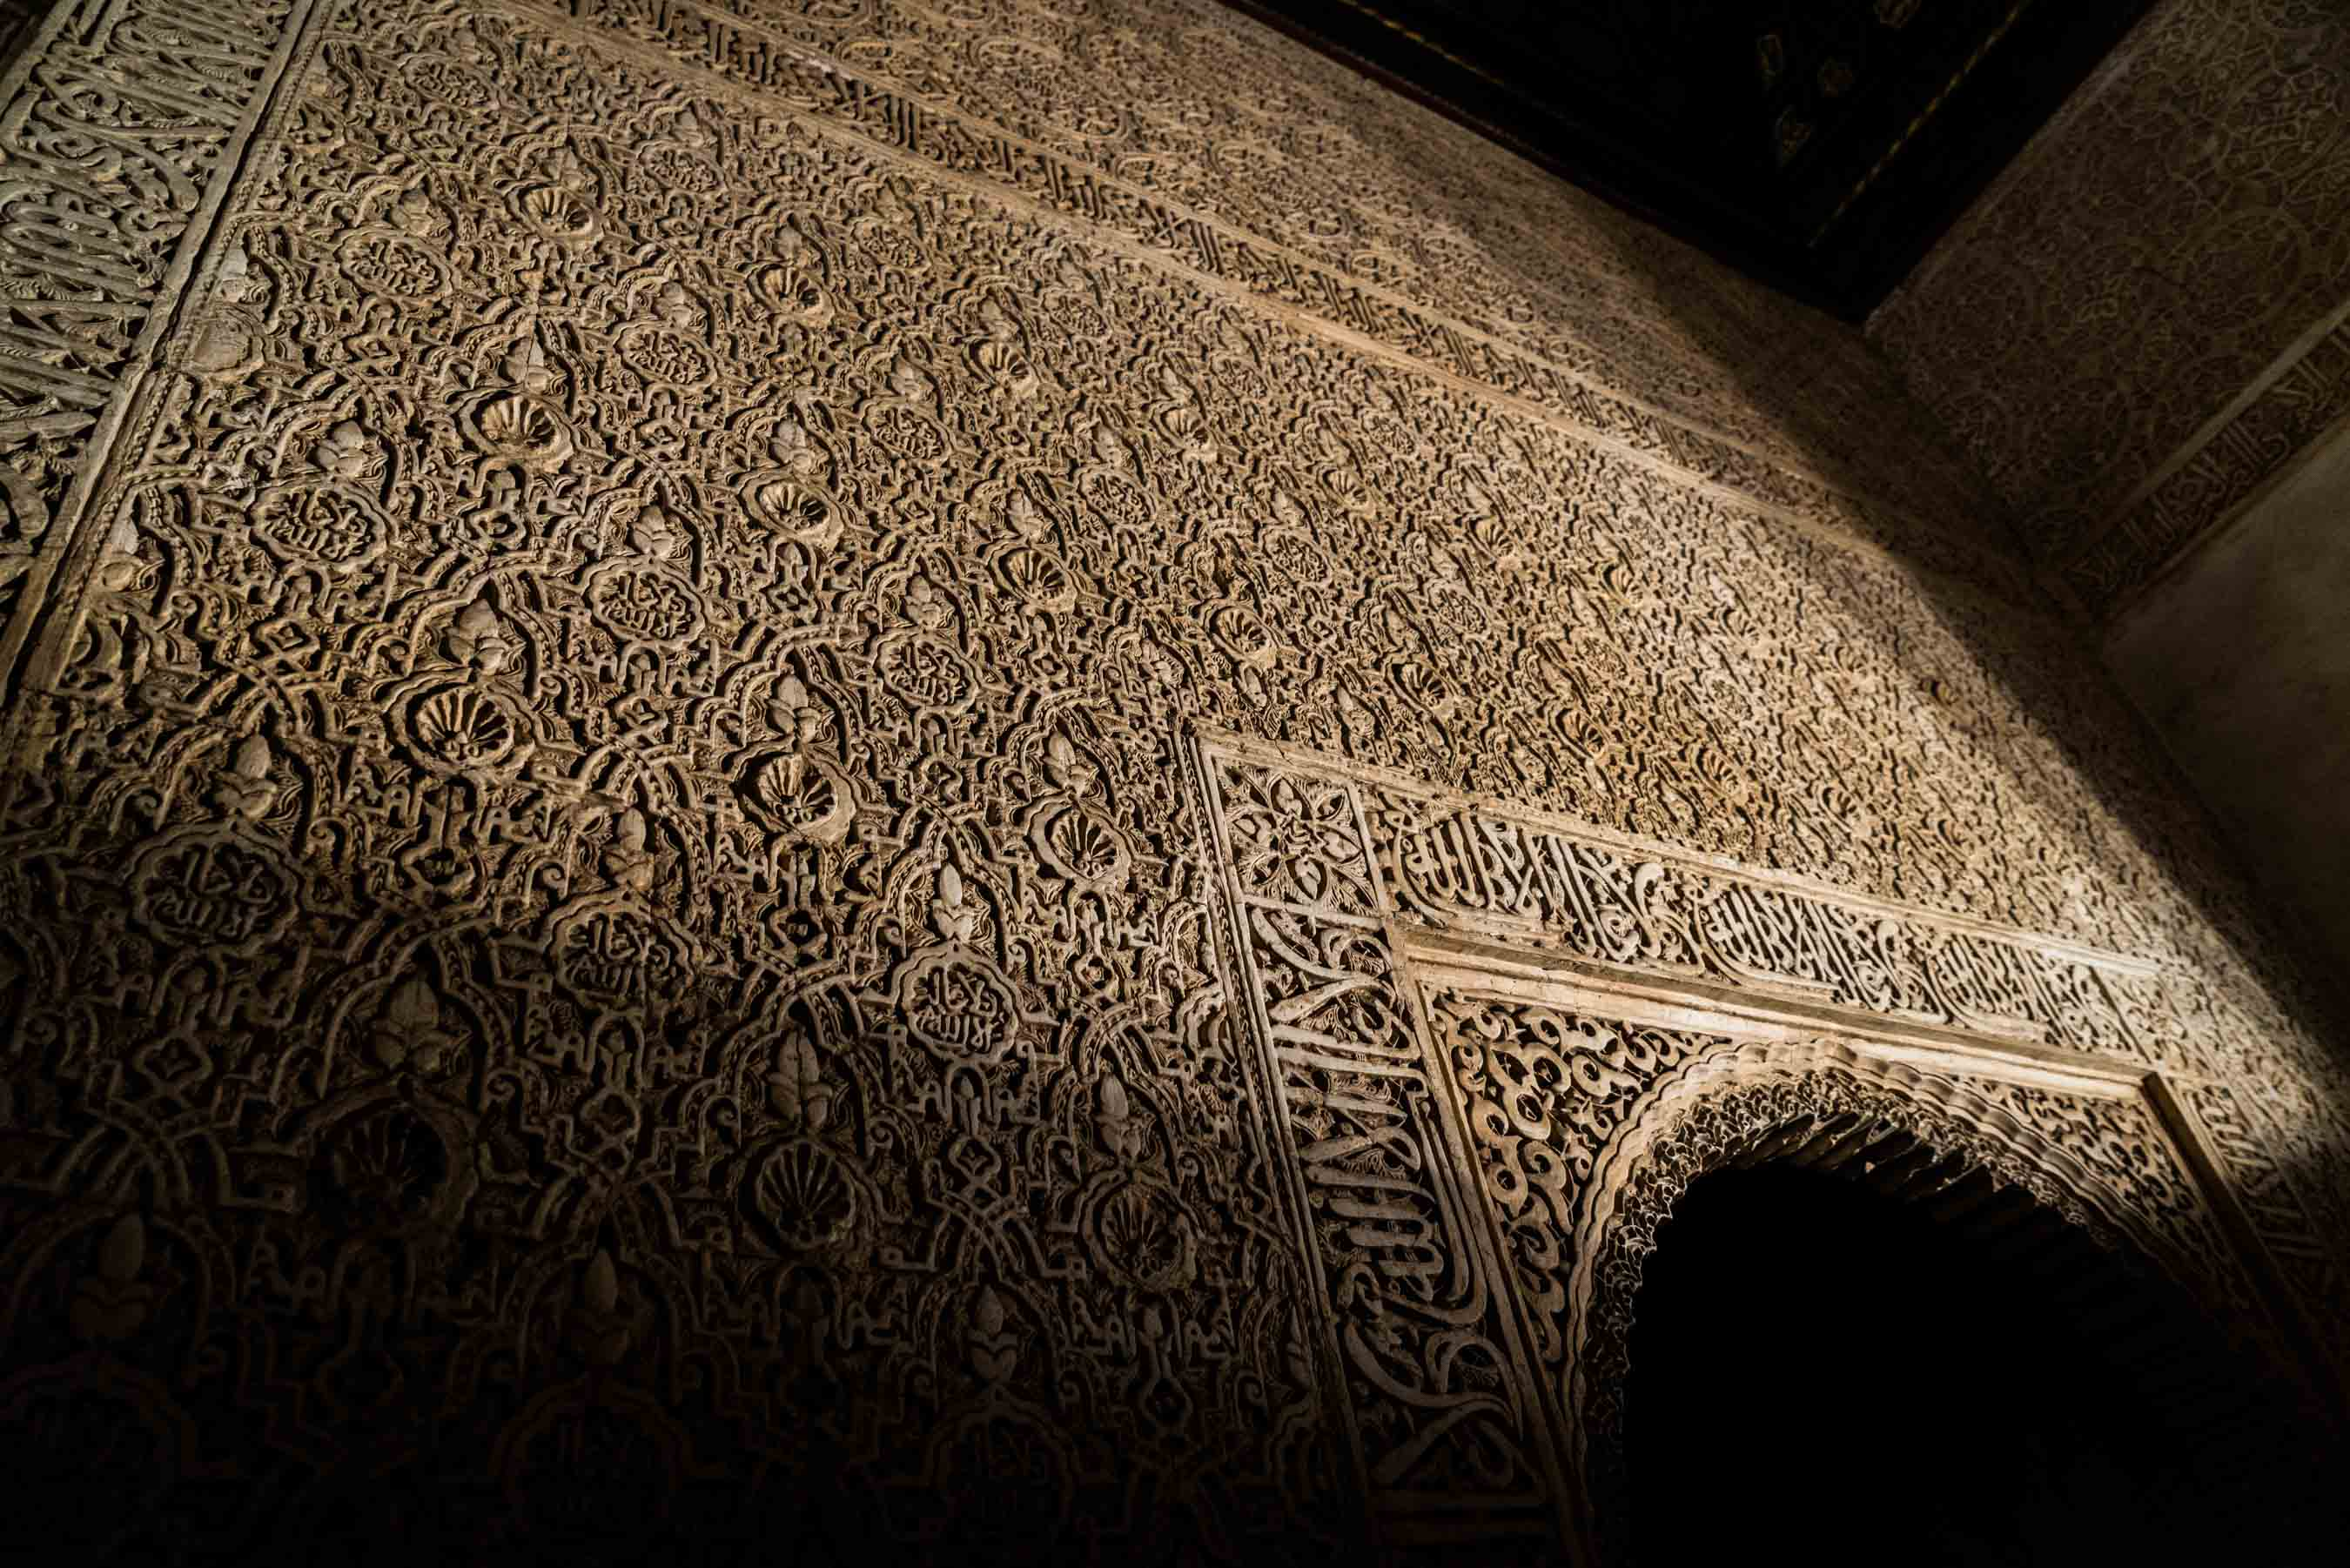 Granada Alhambra - by night Oratory